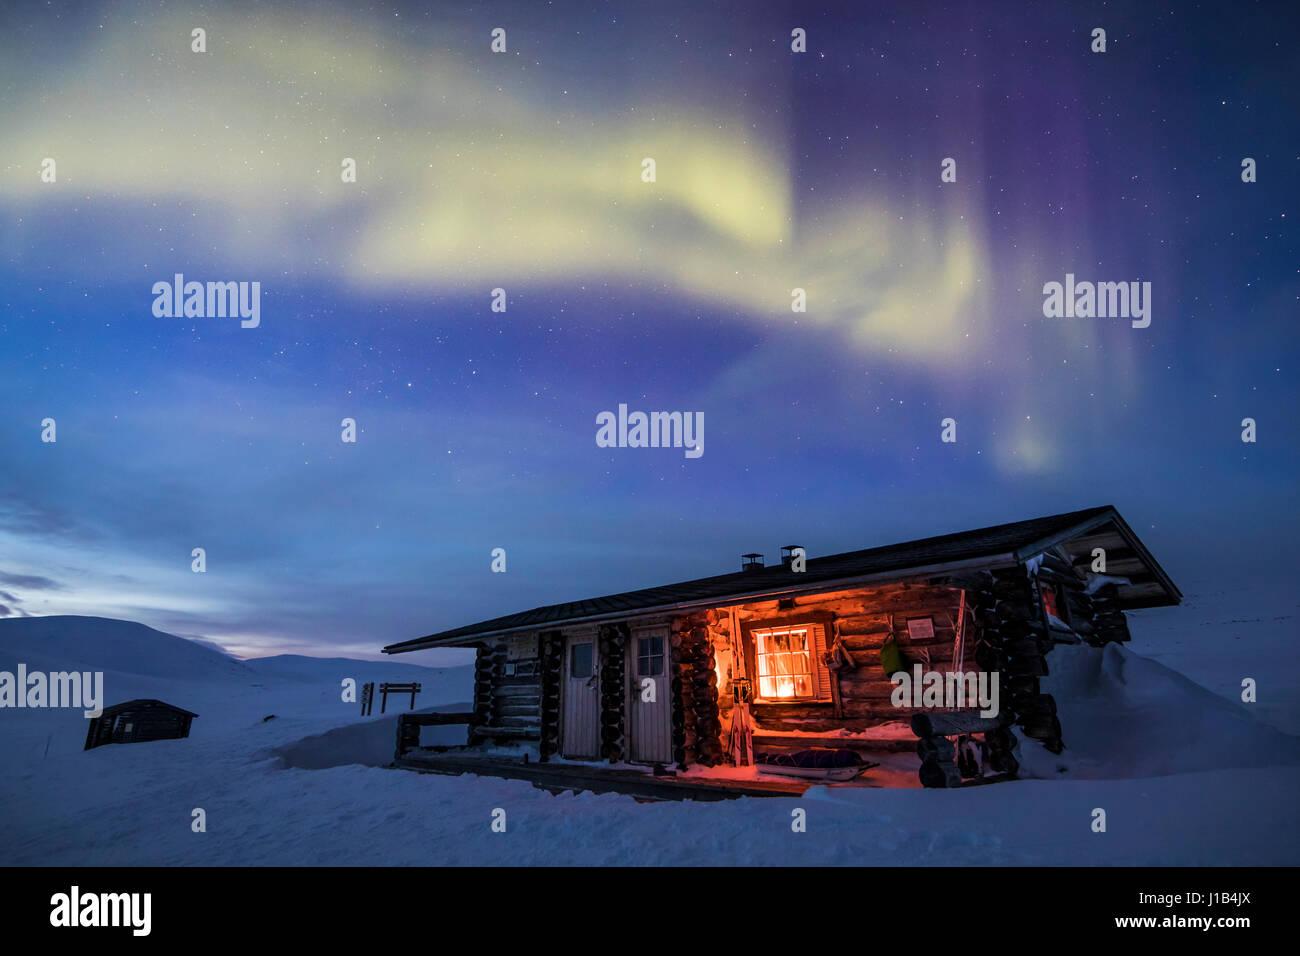 Aprire pihtsusjärvi wilderness hut Immagini Stock